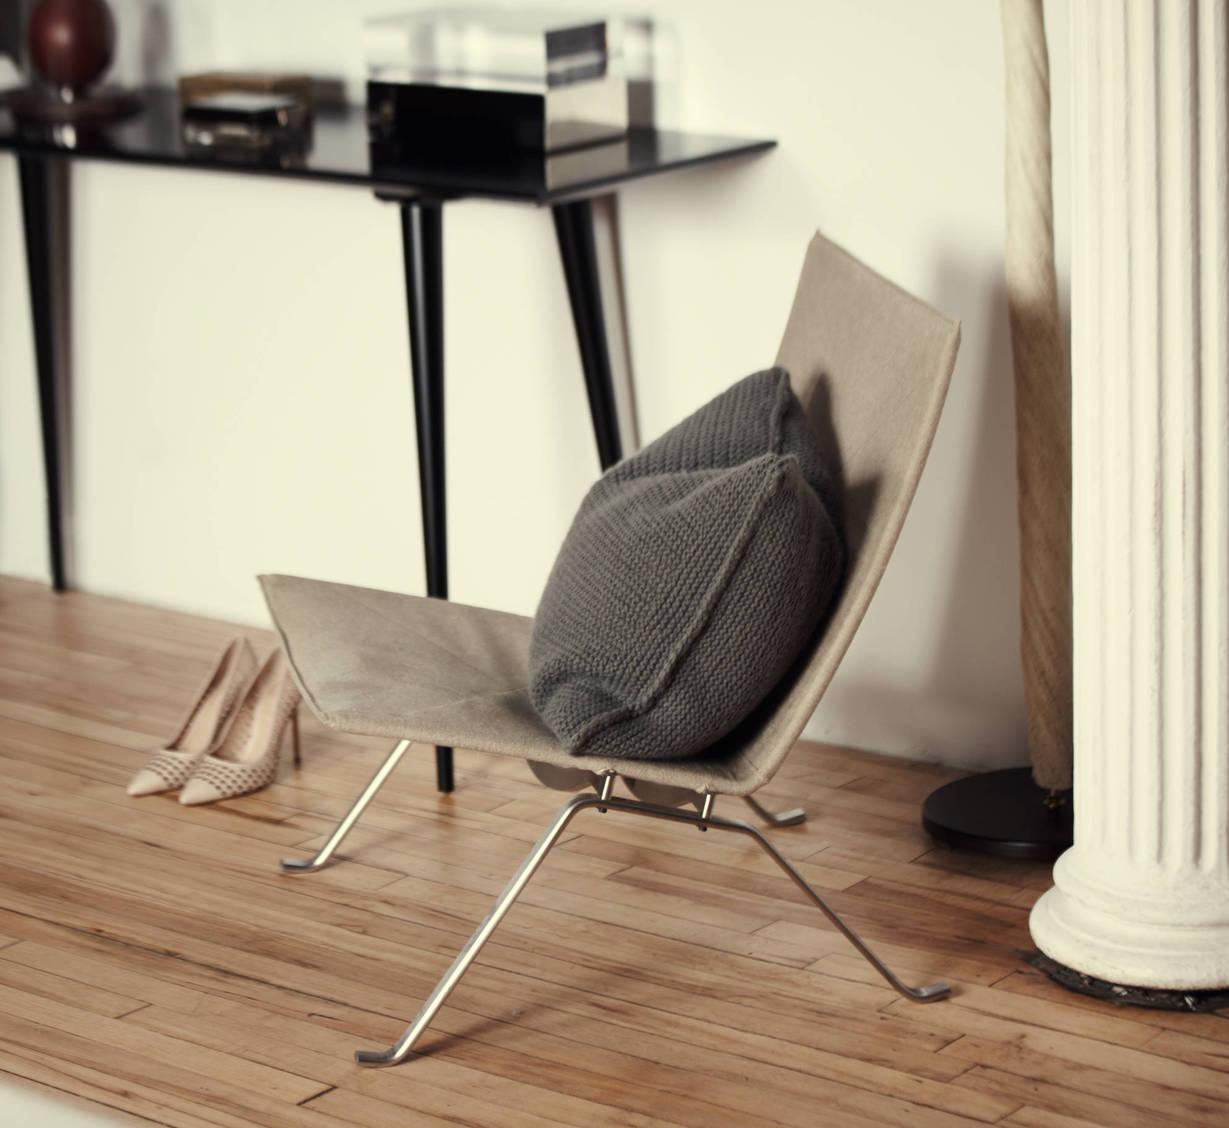 Fritz Hansen PK22 Lounge Chair, Reed Krakoff Perforated Leather Pointed Toe  Bionic Academy Pump, Flair Ice Box, M|n Originals Custom Maxim Console. U201c